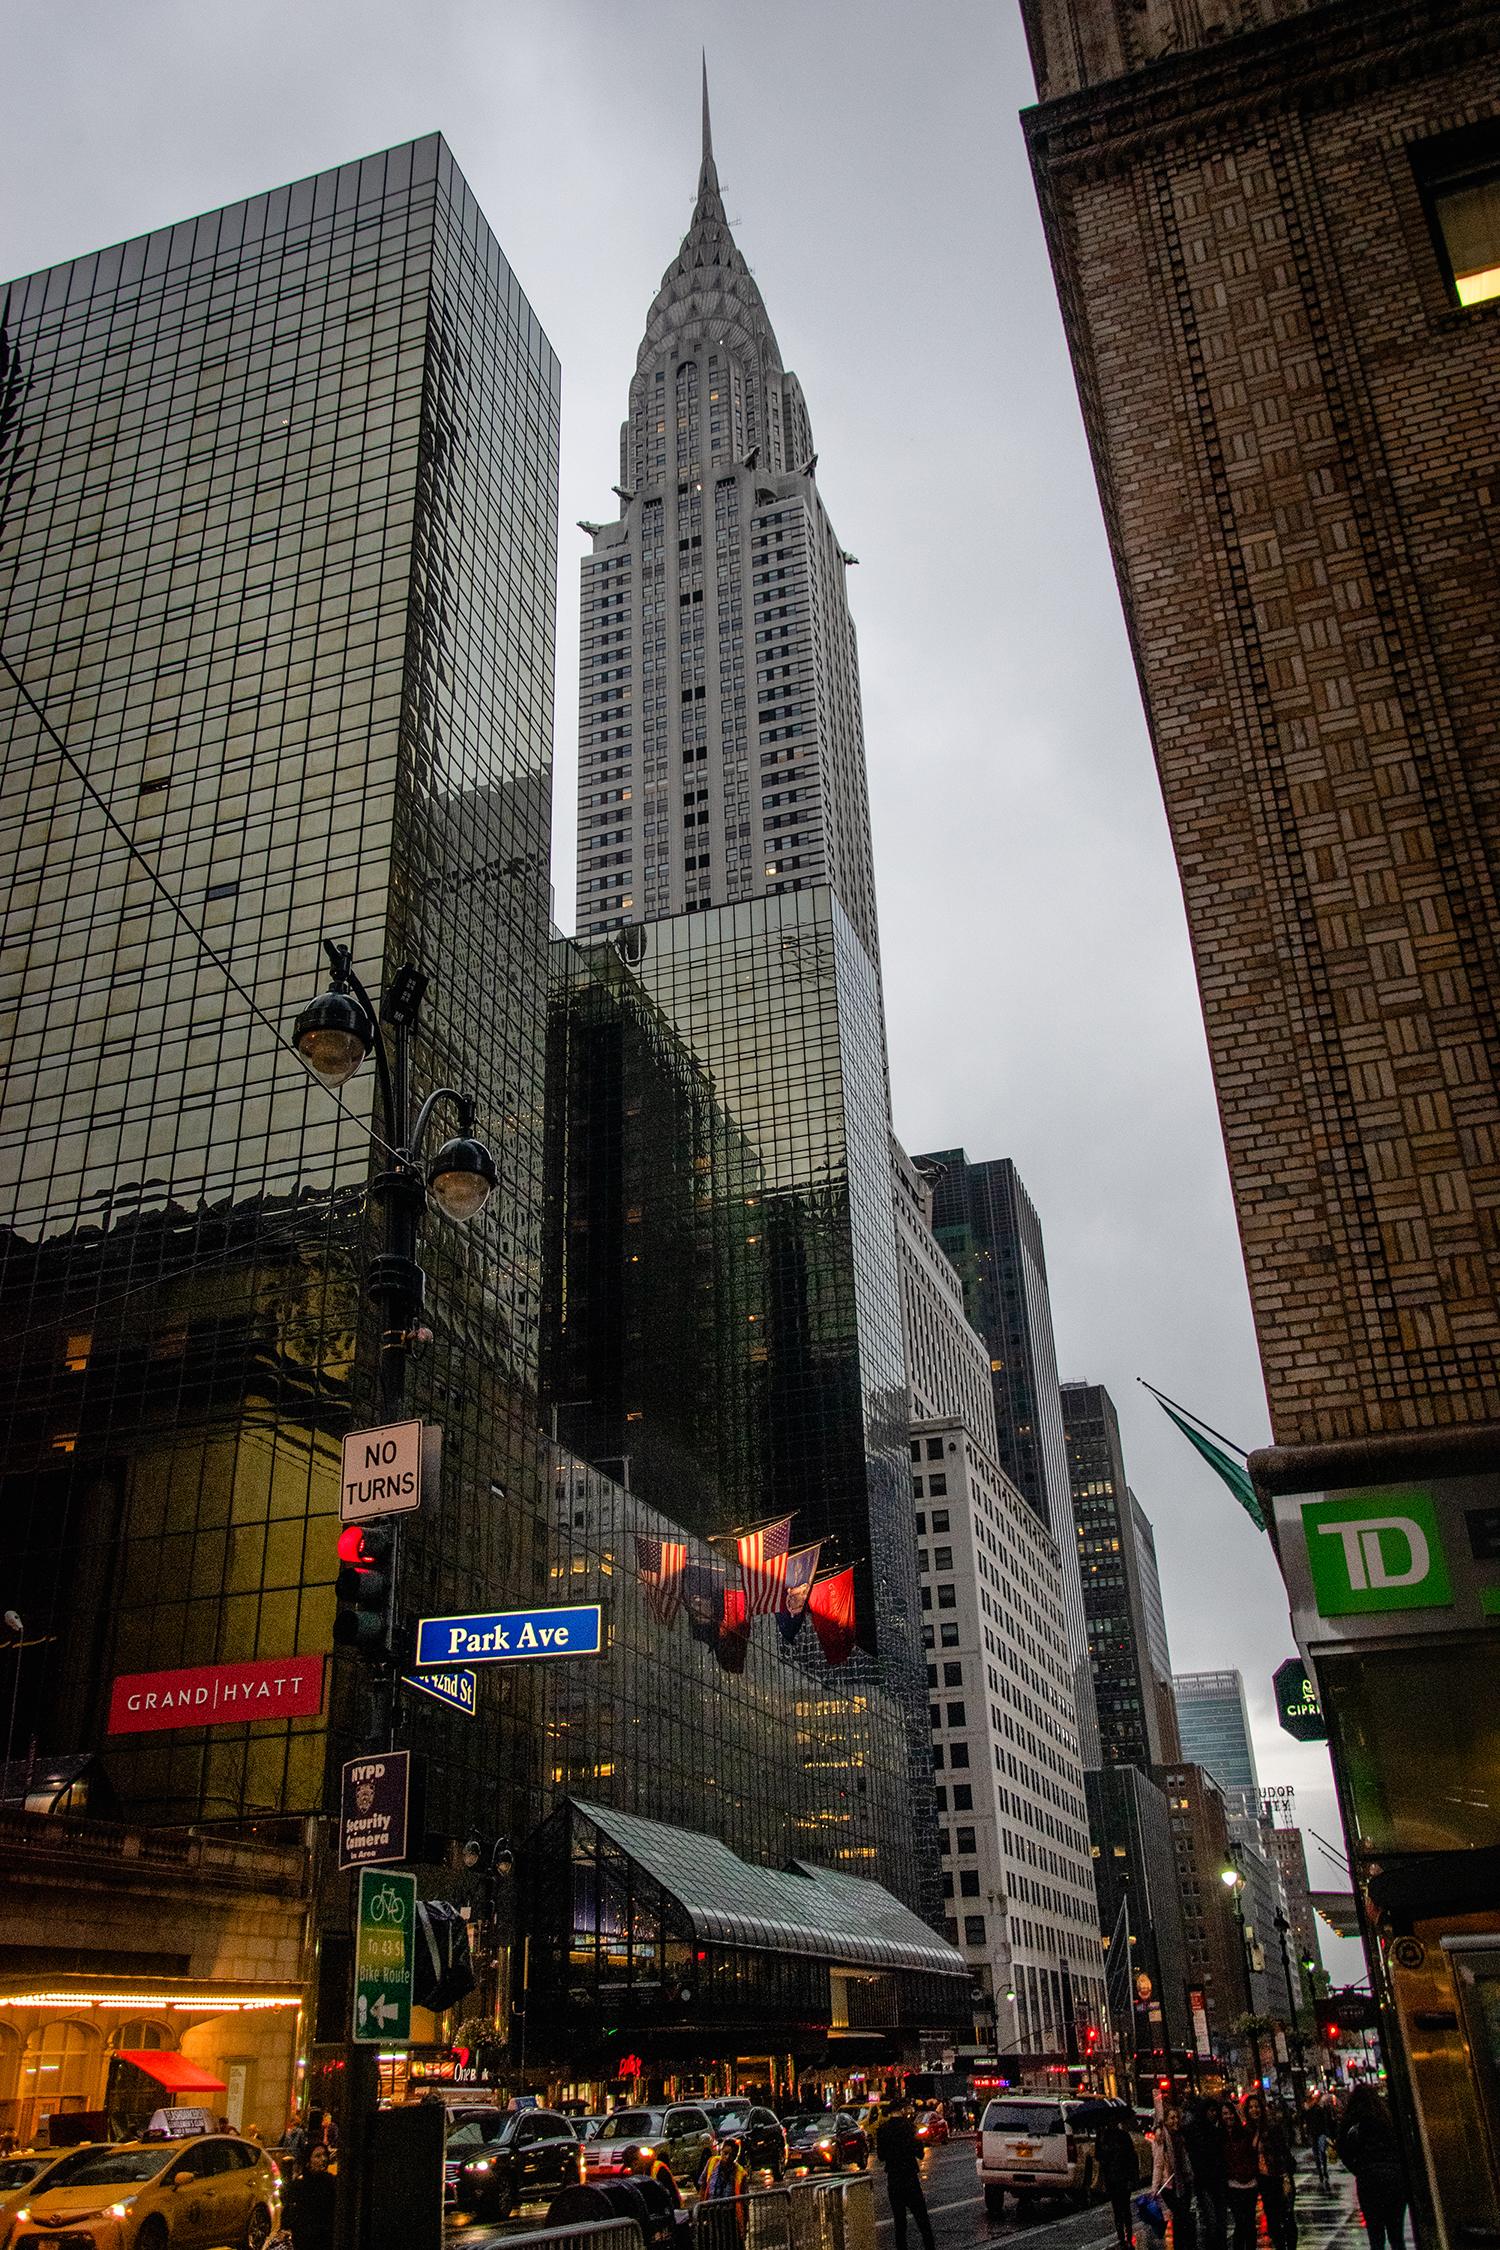 Manhattan_New_York_City_USA_2018_Ruo_Ling_Lu